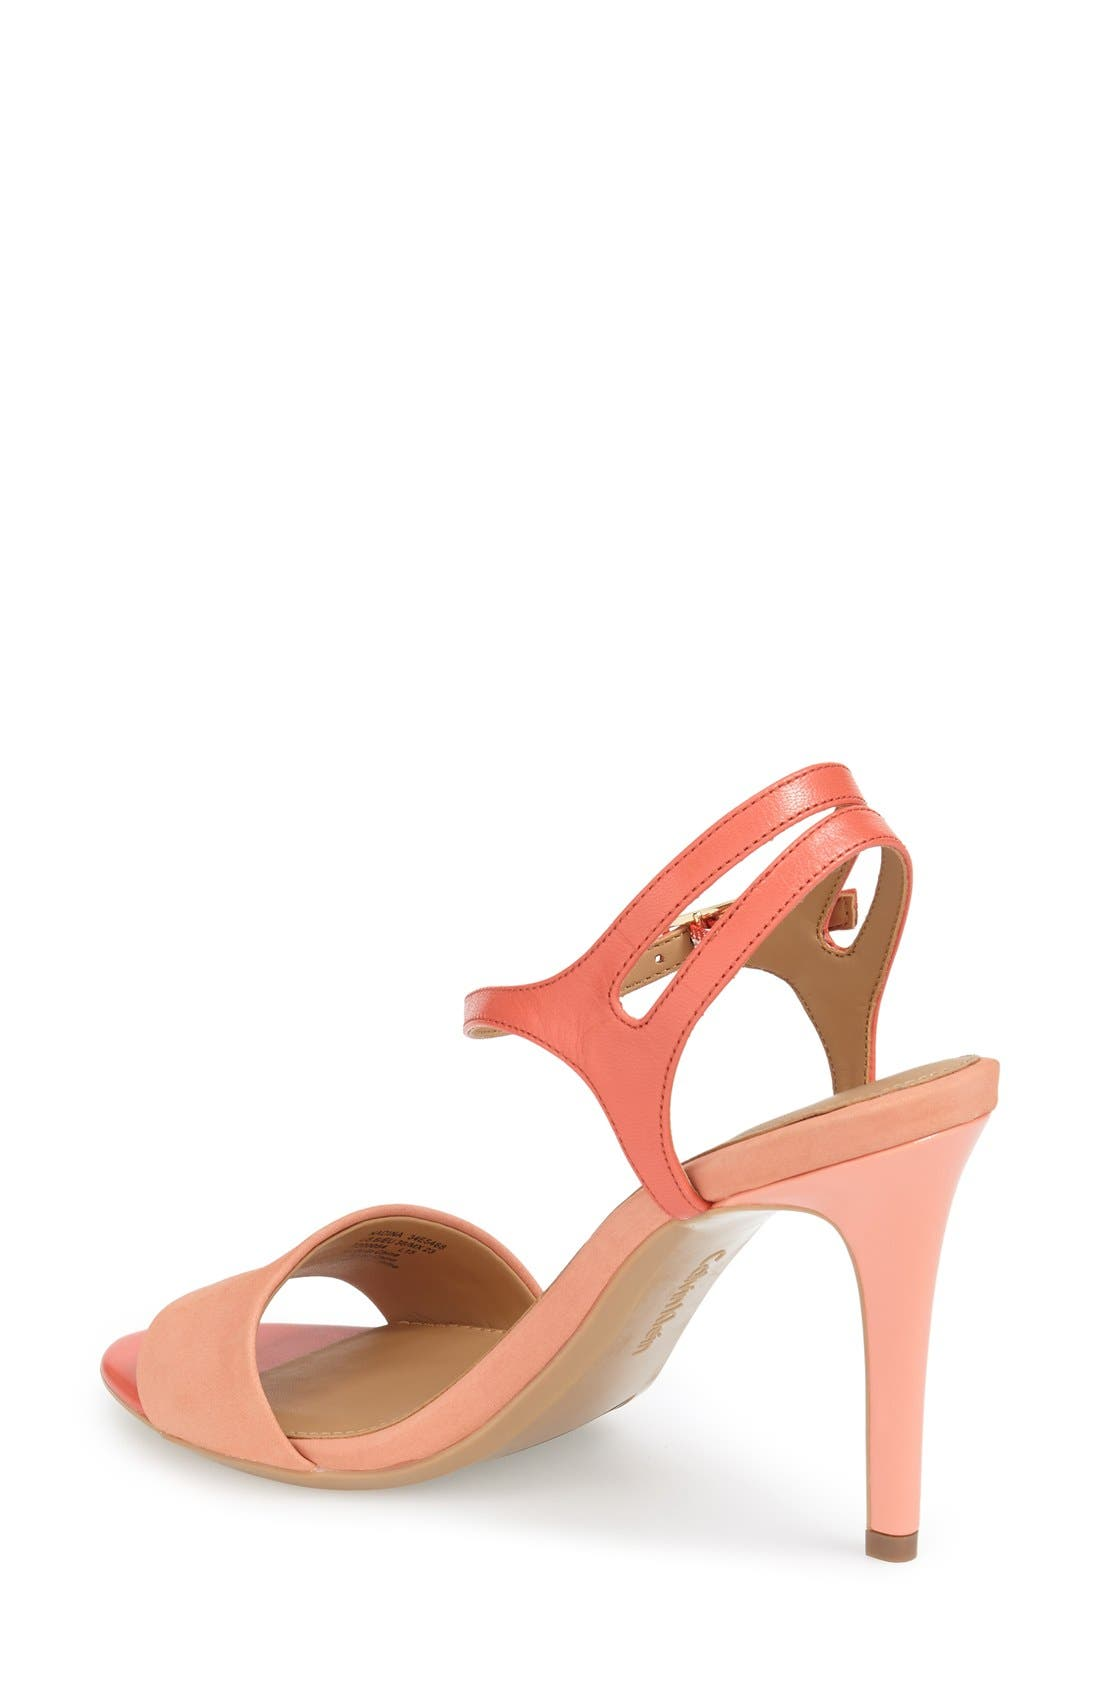 'Nadina' Ankle Strap Sandal,                             Alternate thumbnail 2, color,                             Salmon/ Deep Coral Leather